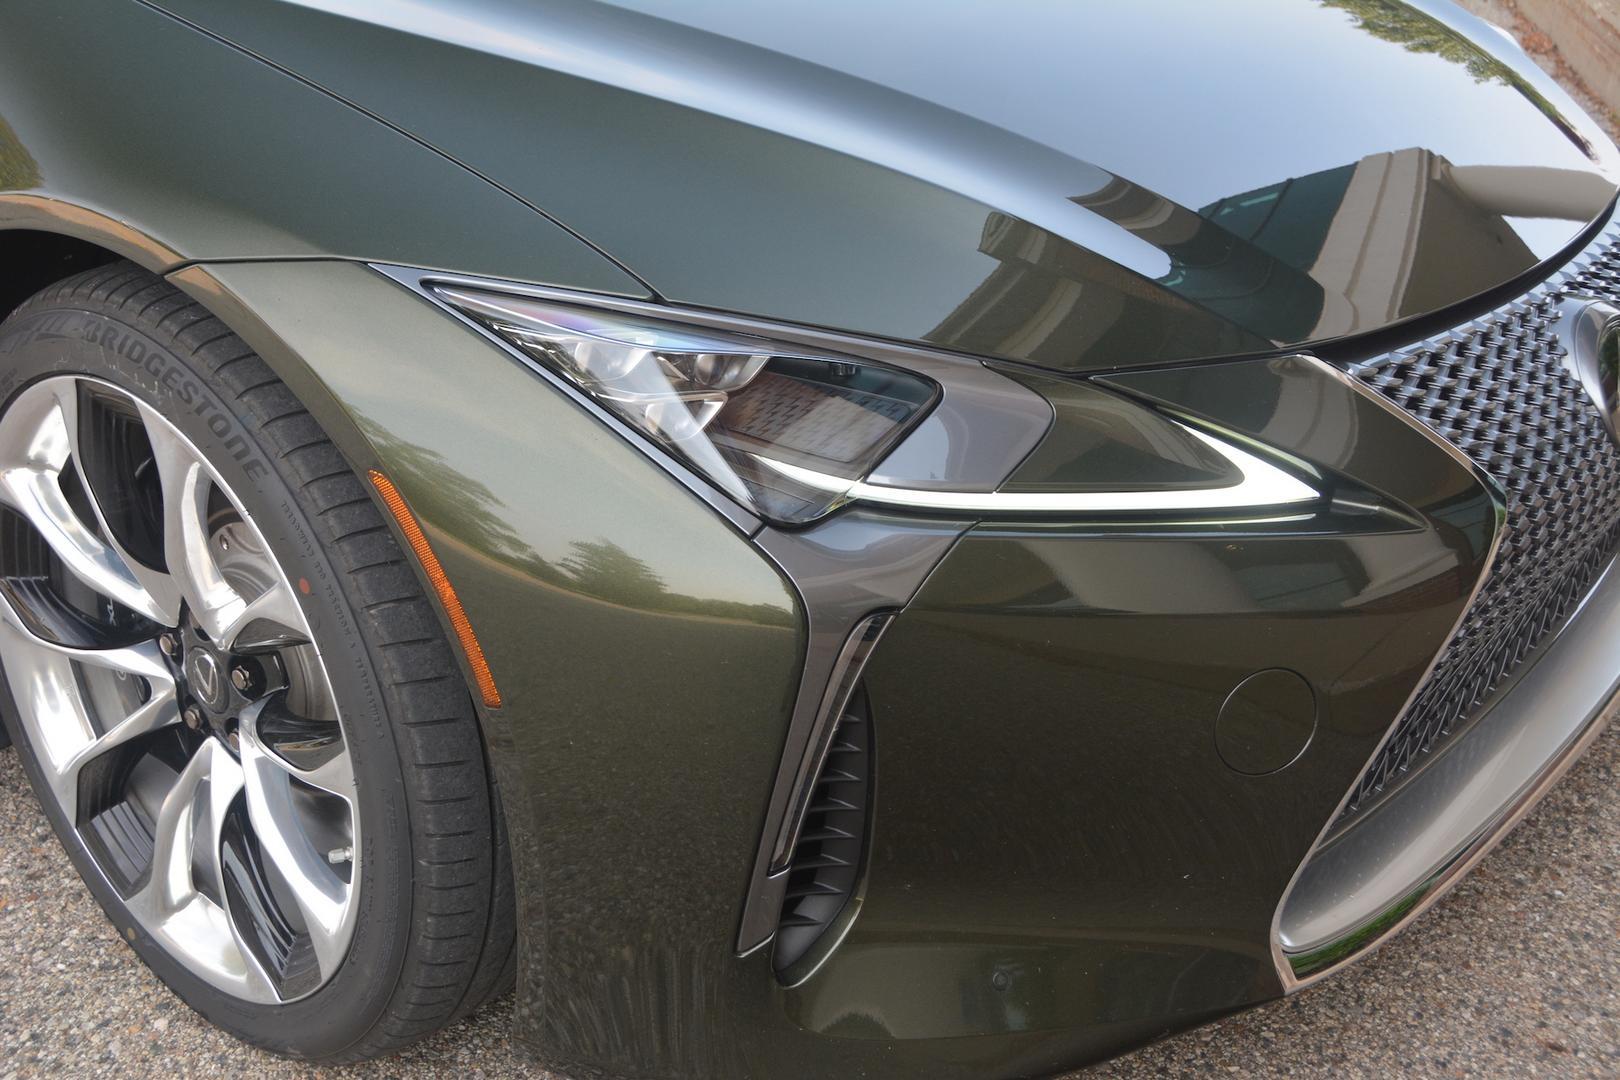 Lexus LC 500 Convertible headlights